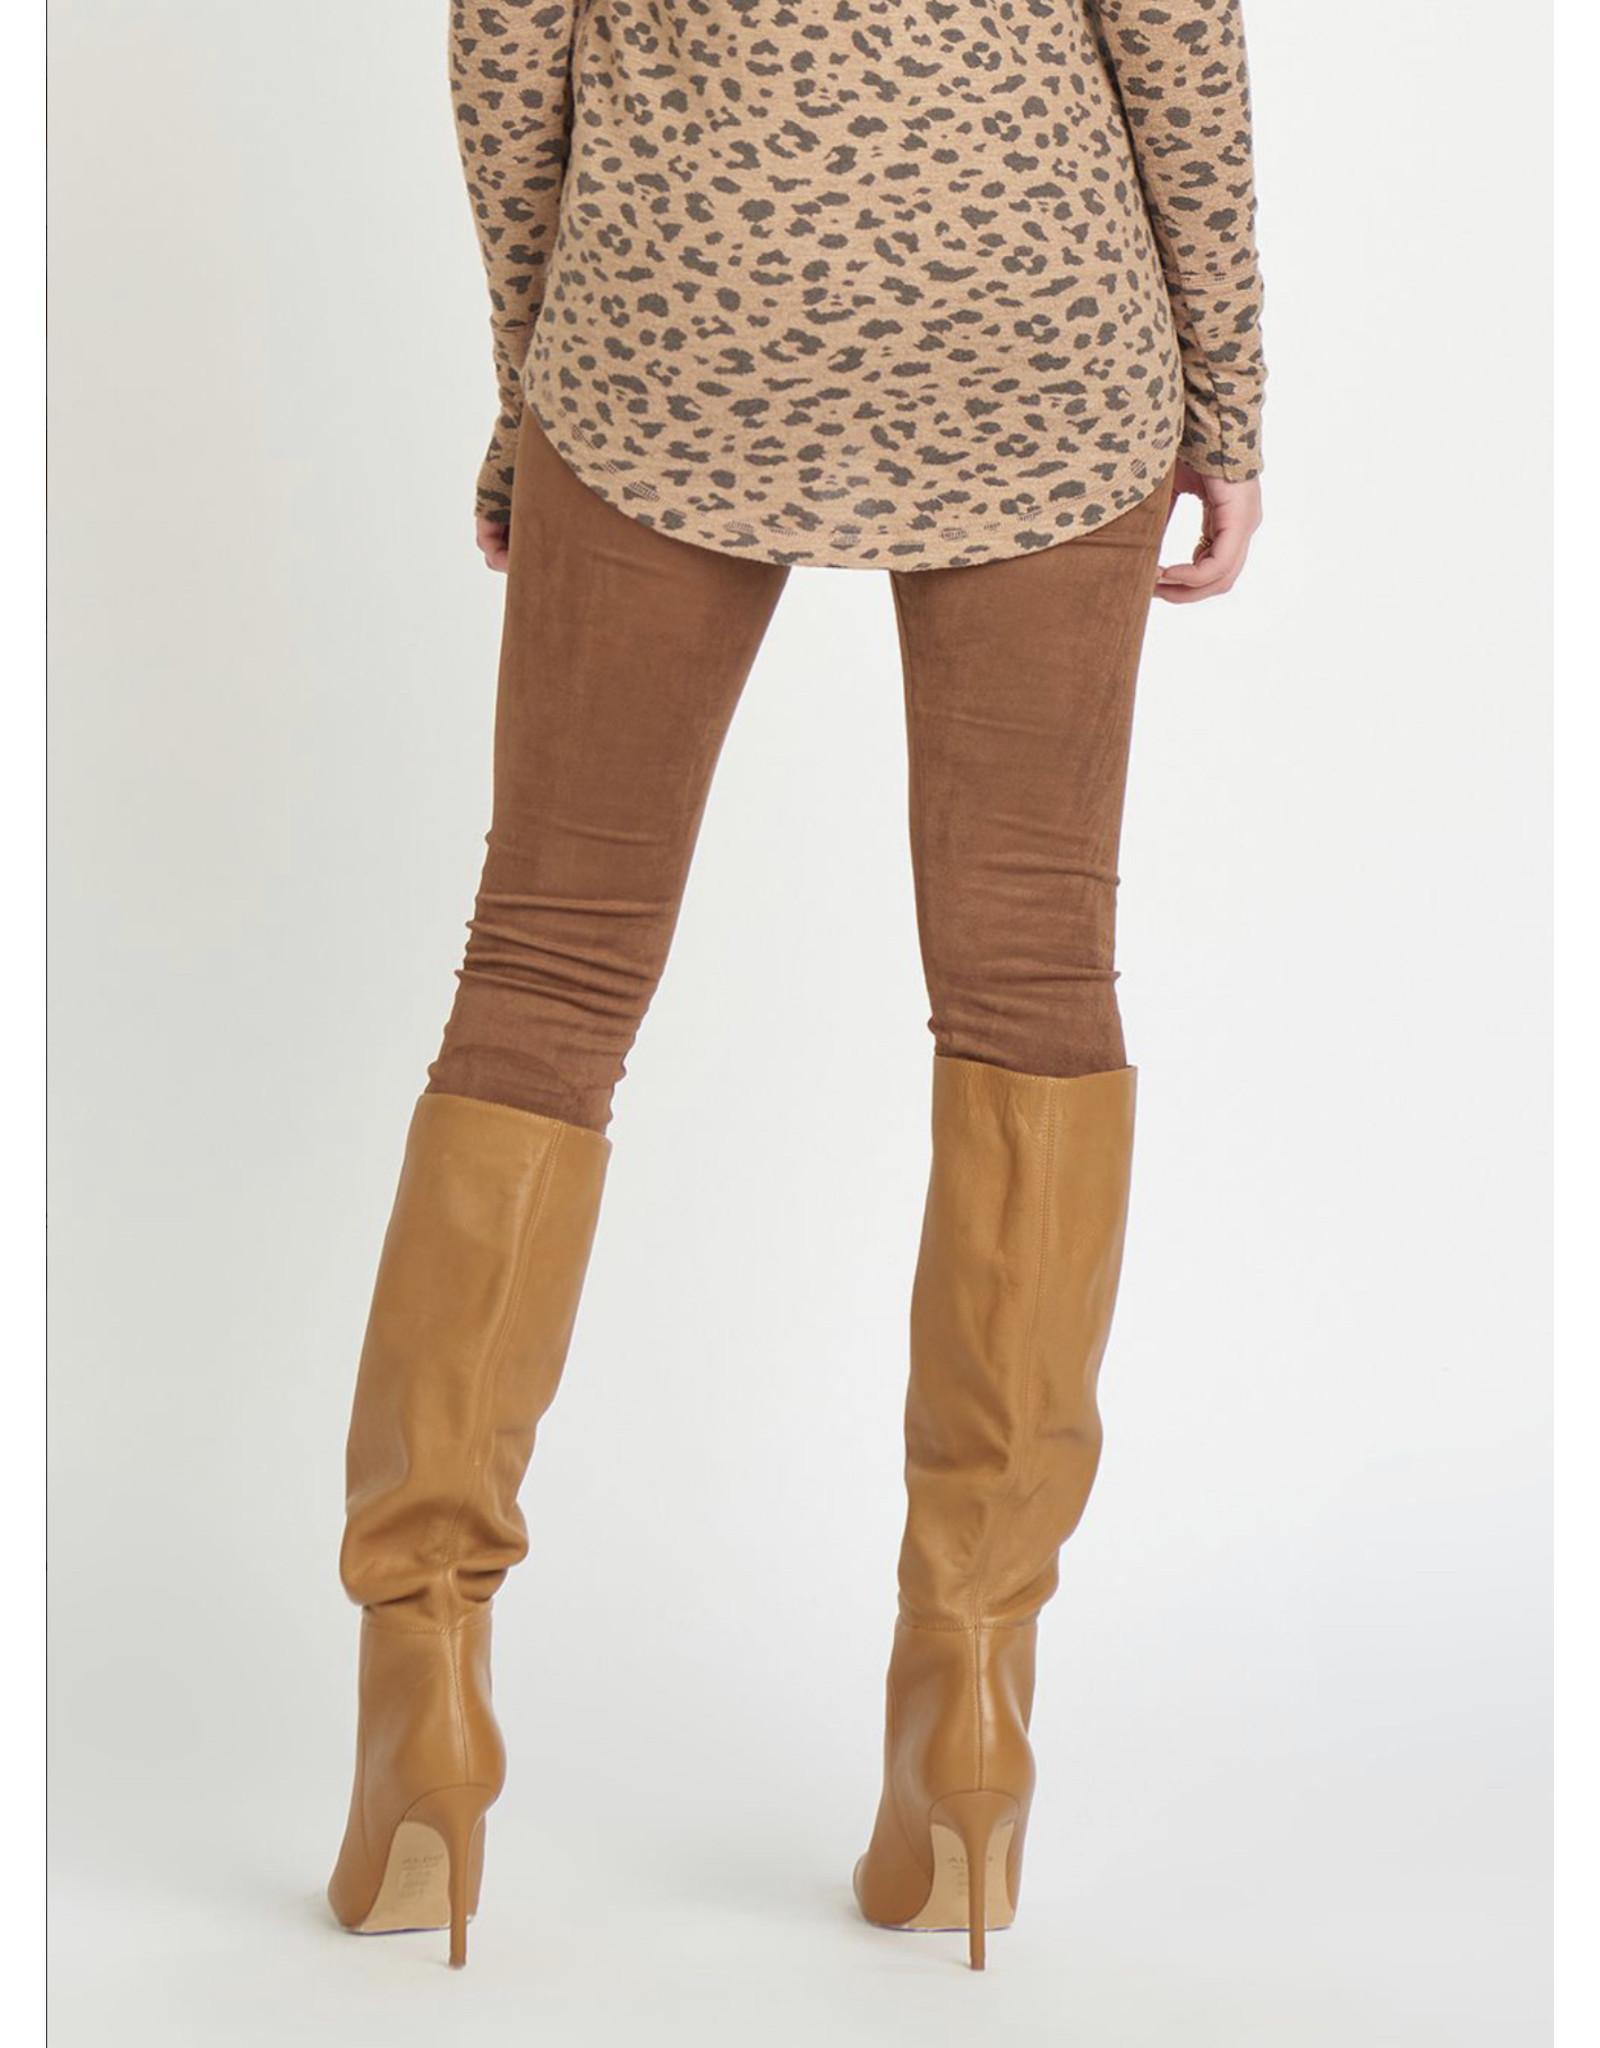 Faux Suede Leggings, Camel